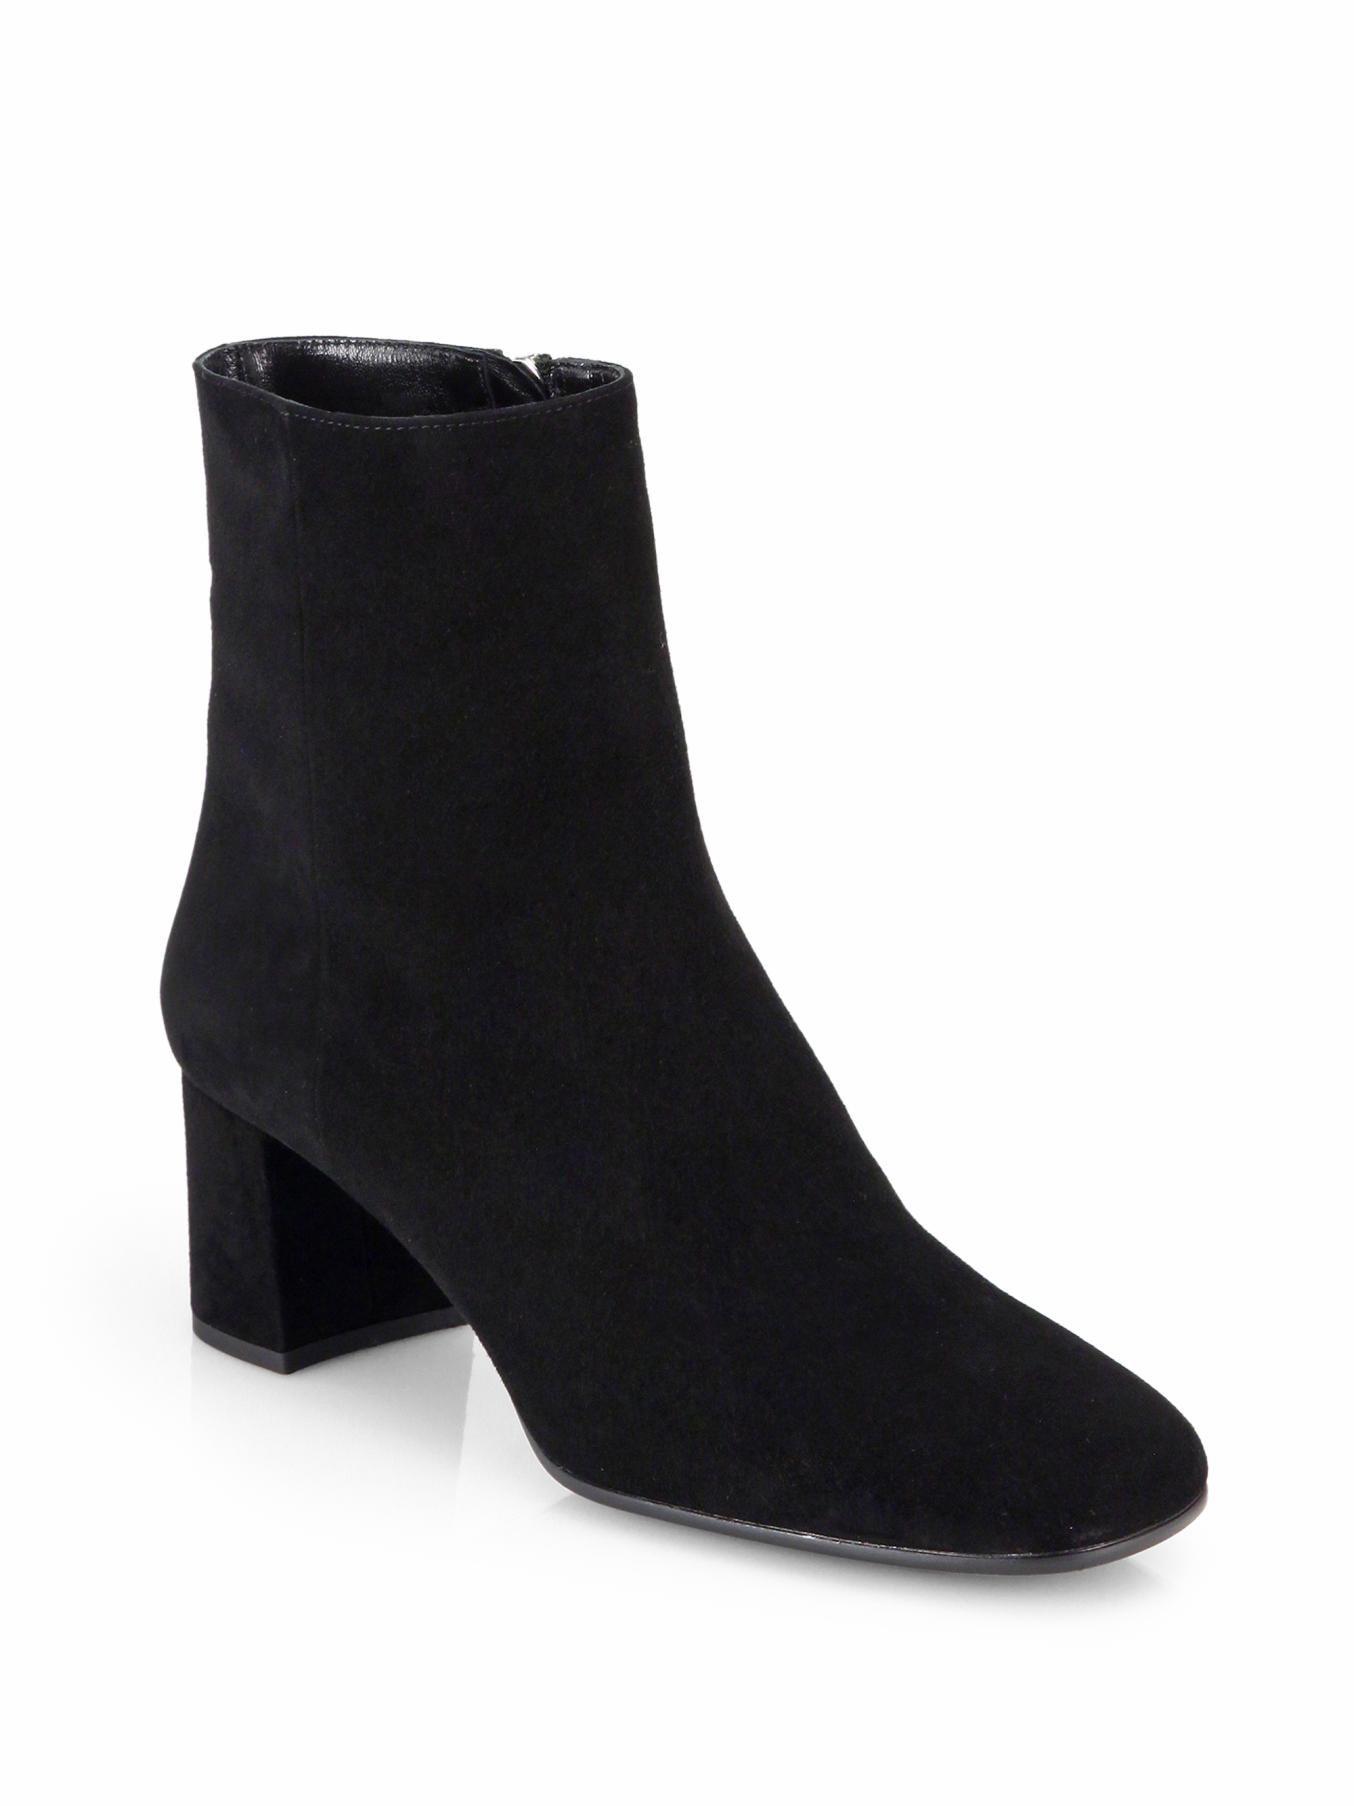 prada suede ankle boots in black nero black lyst